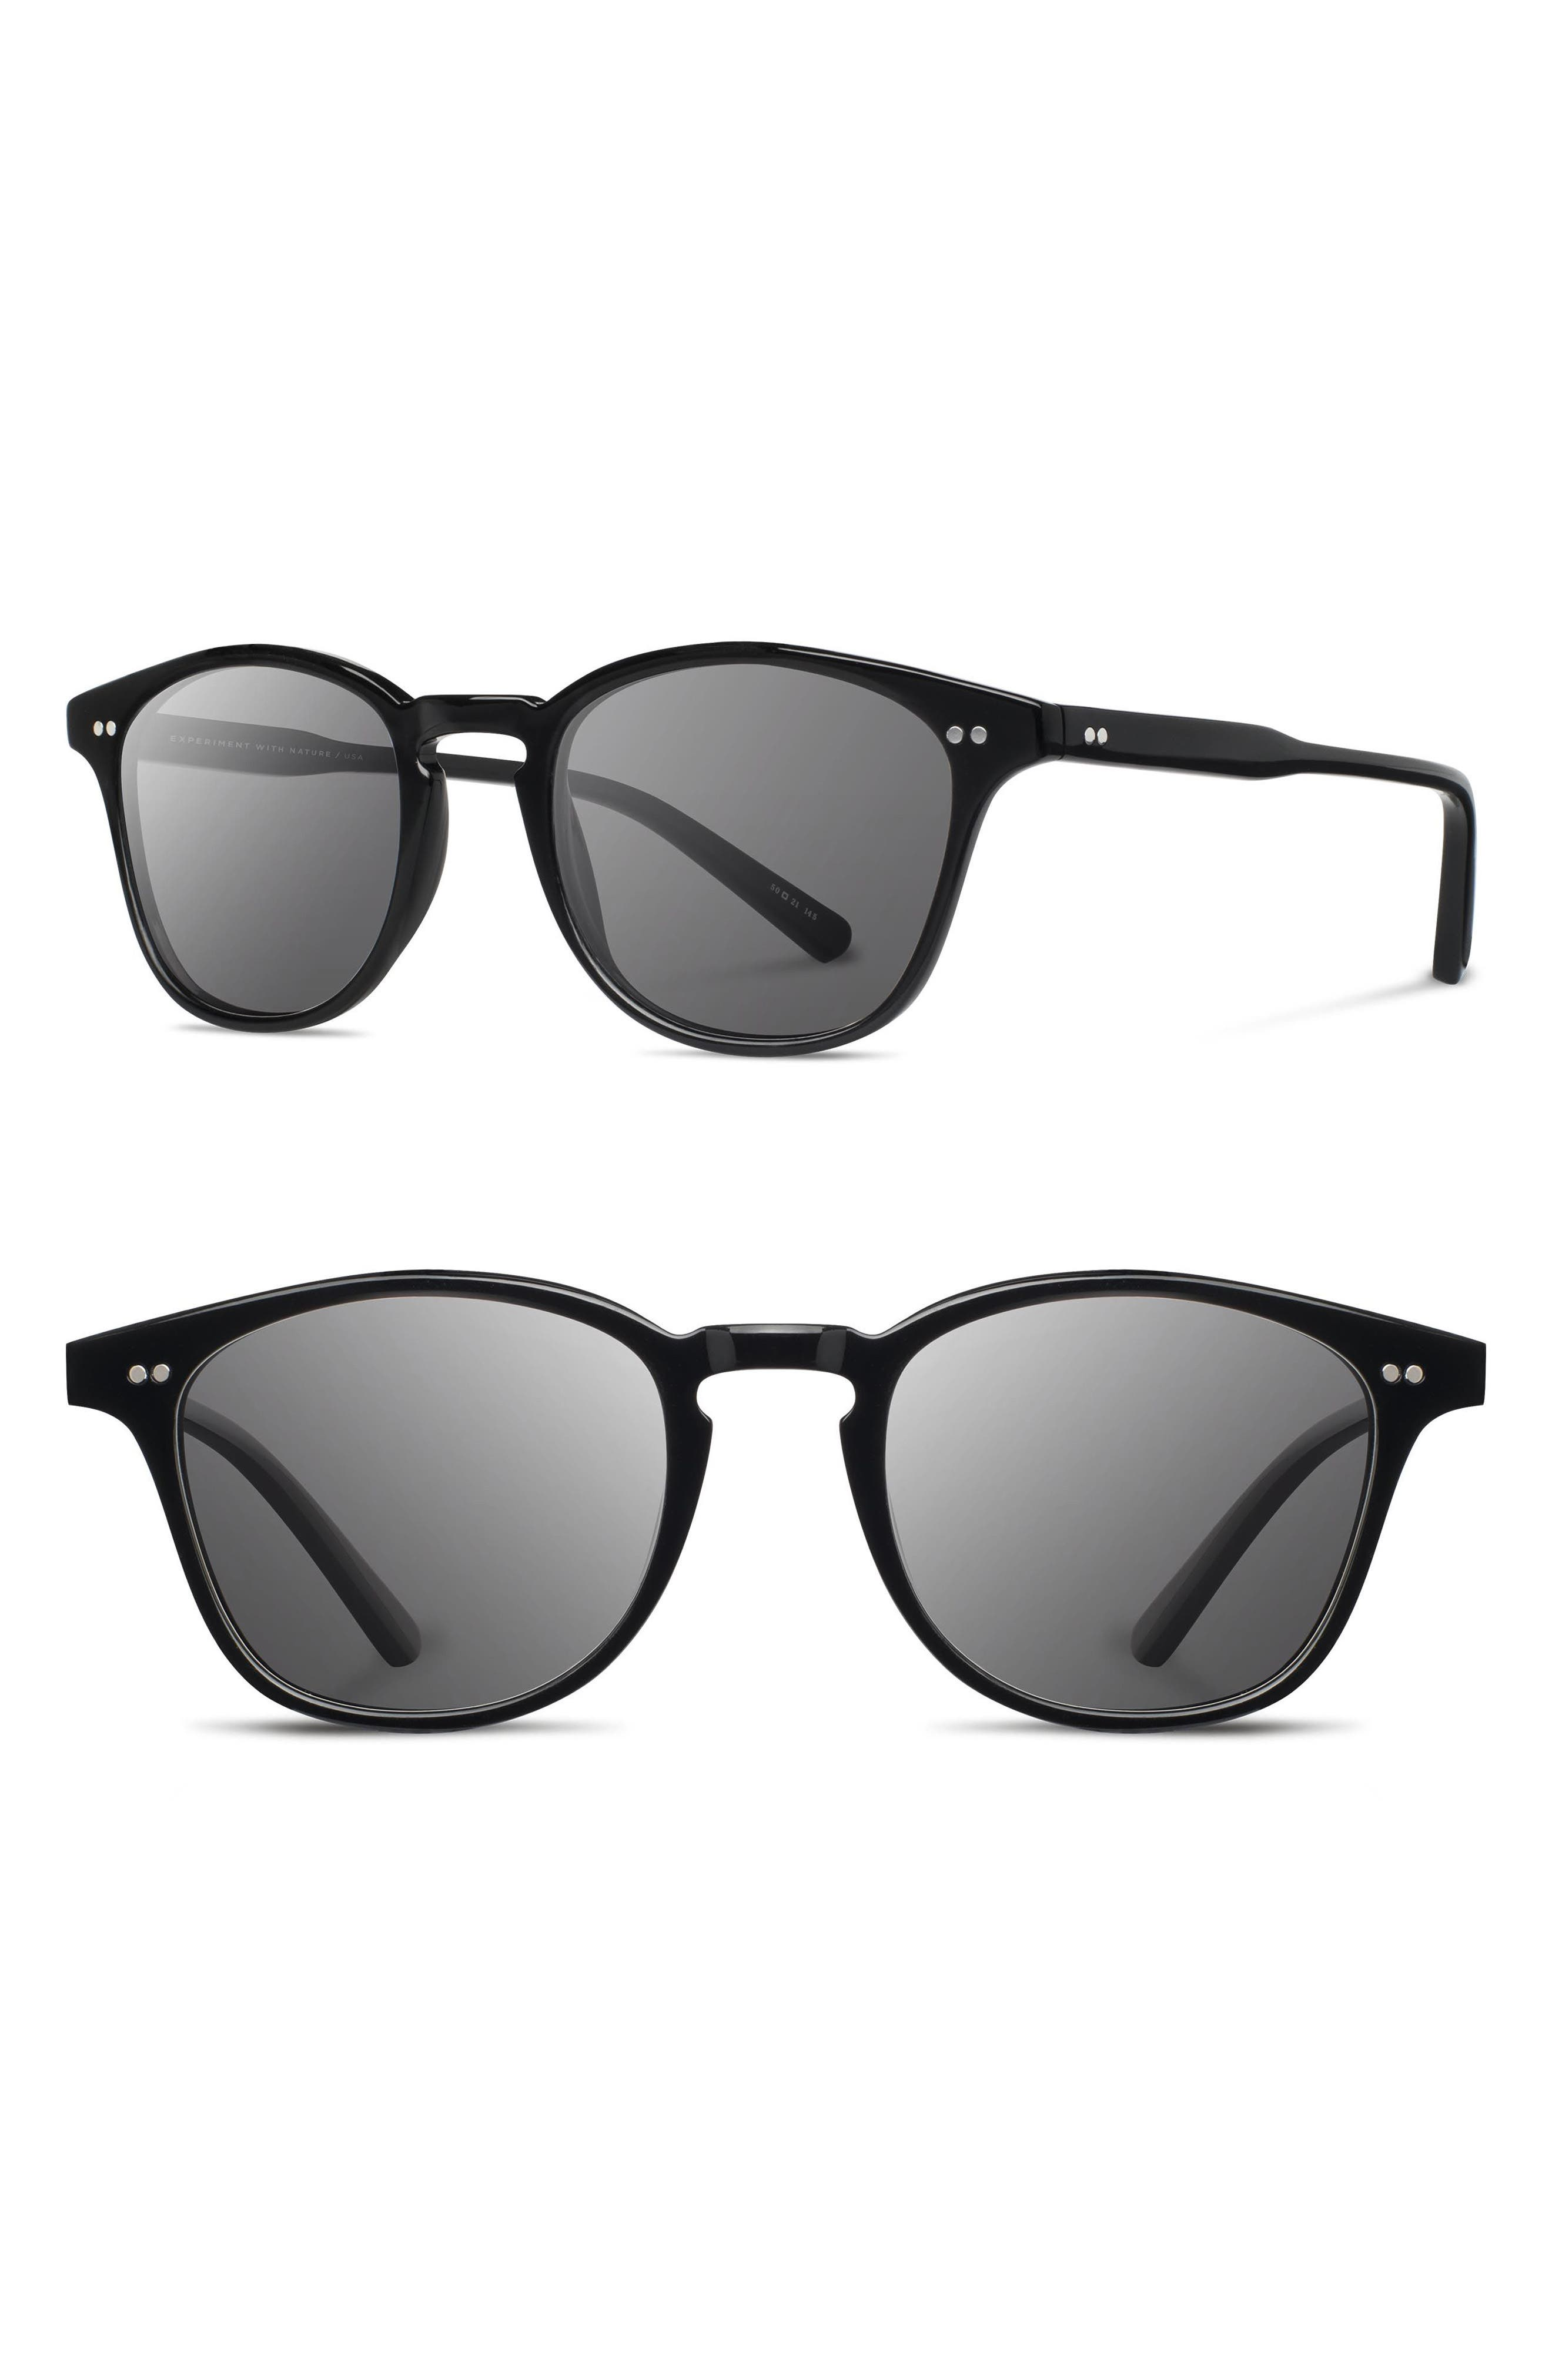 Kennedy 50mm Polarized Sunglasses,                             Main thumbnail 1, color,                             Black/ Grey Polarized